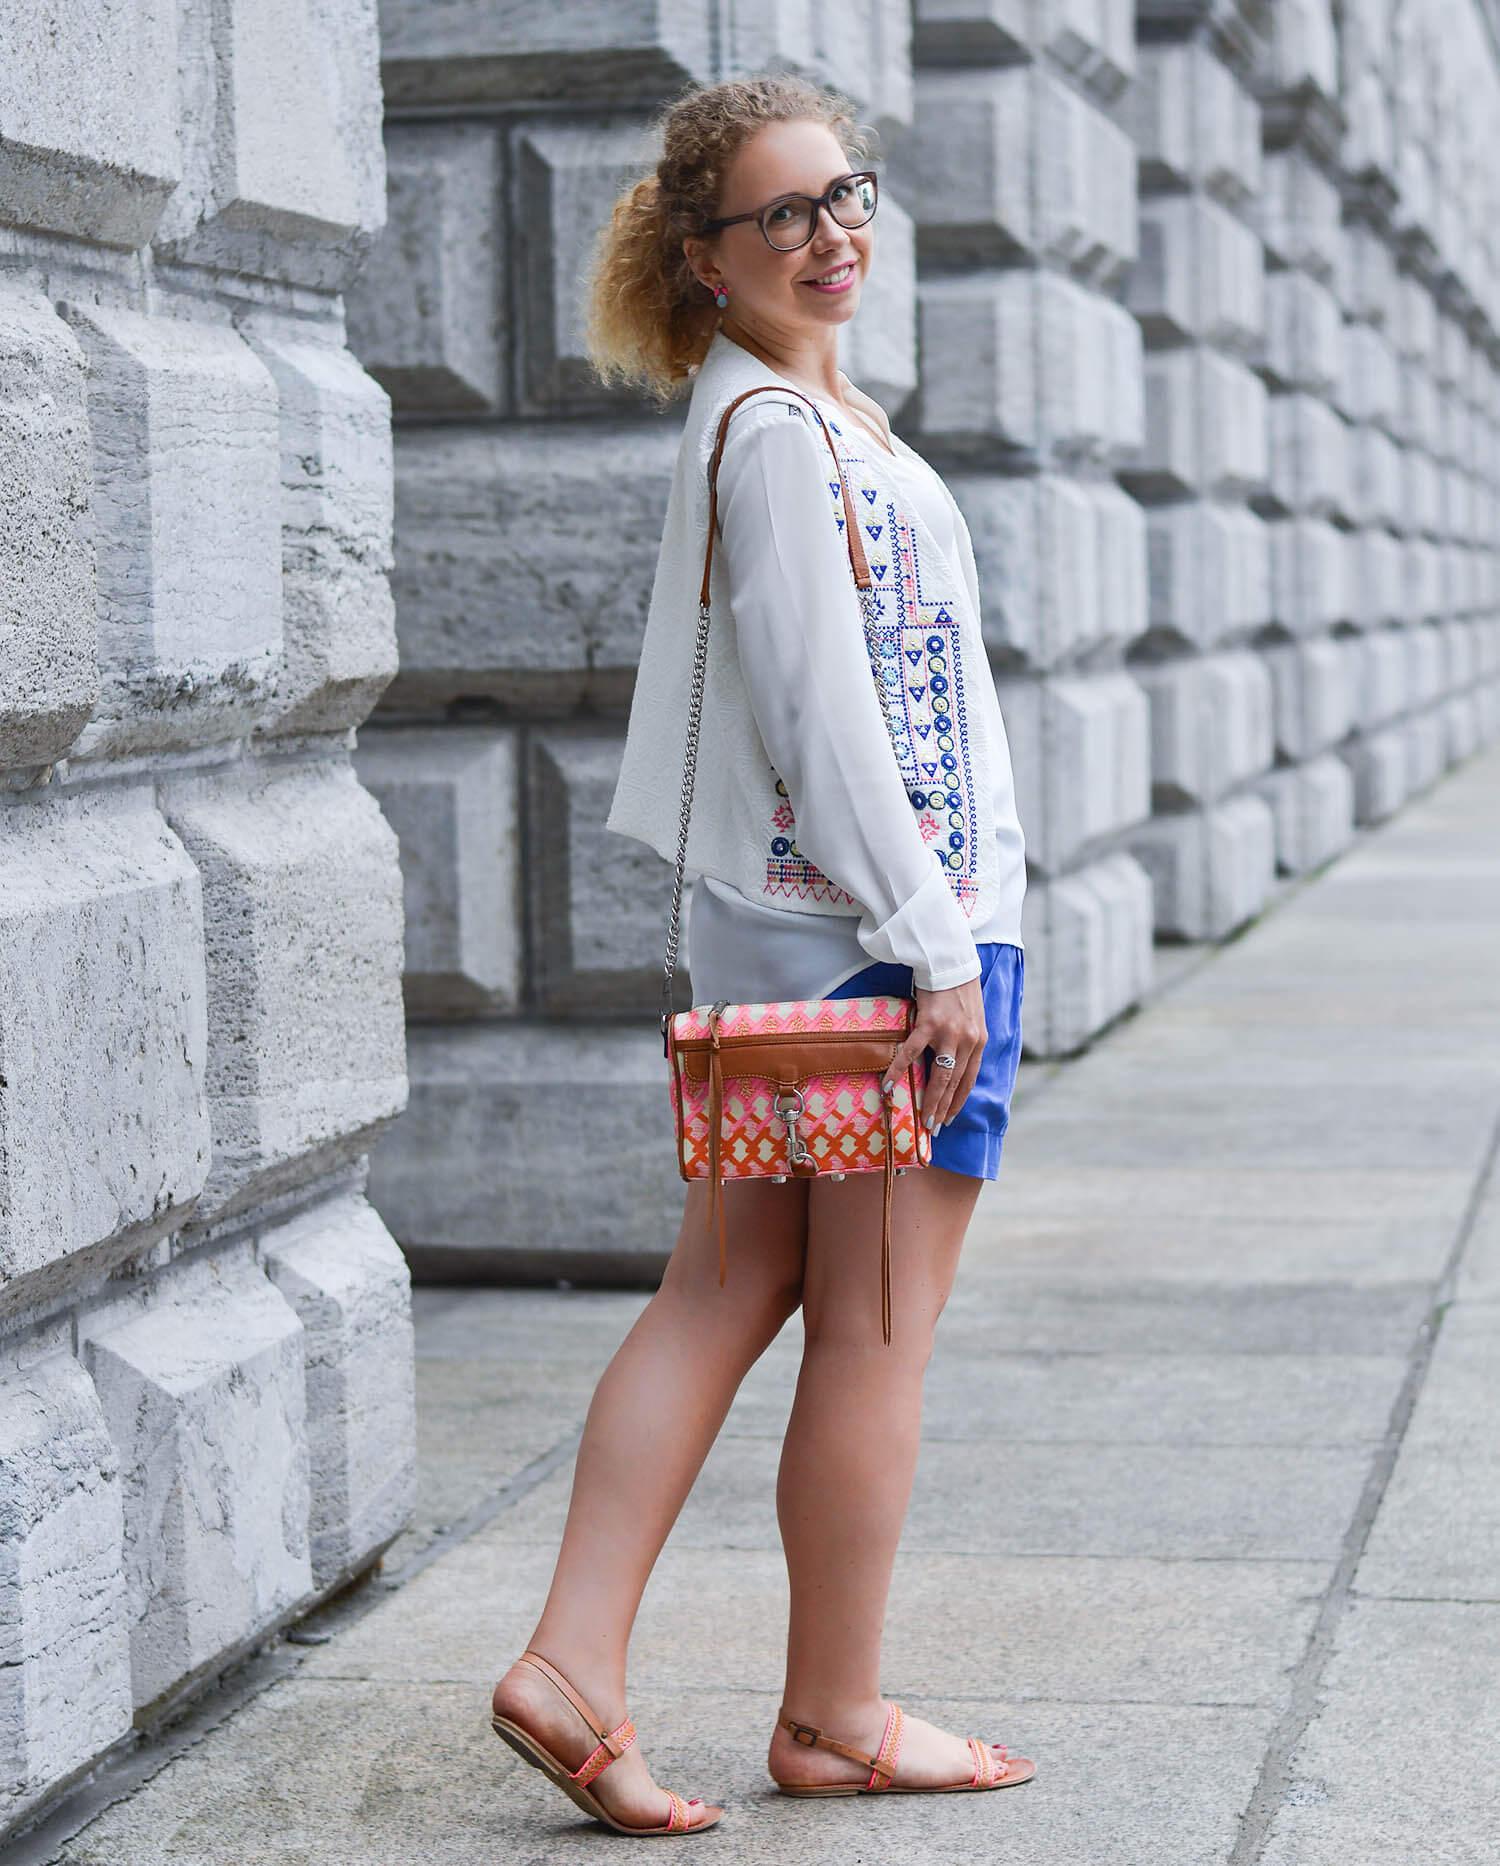 Kationette-fashionblog-nrw-Outfit-Azure-and-White-Ibiza-Vibes-streetstyle